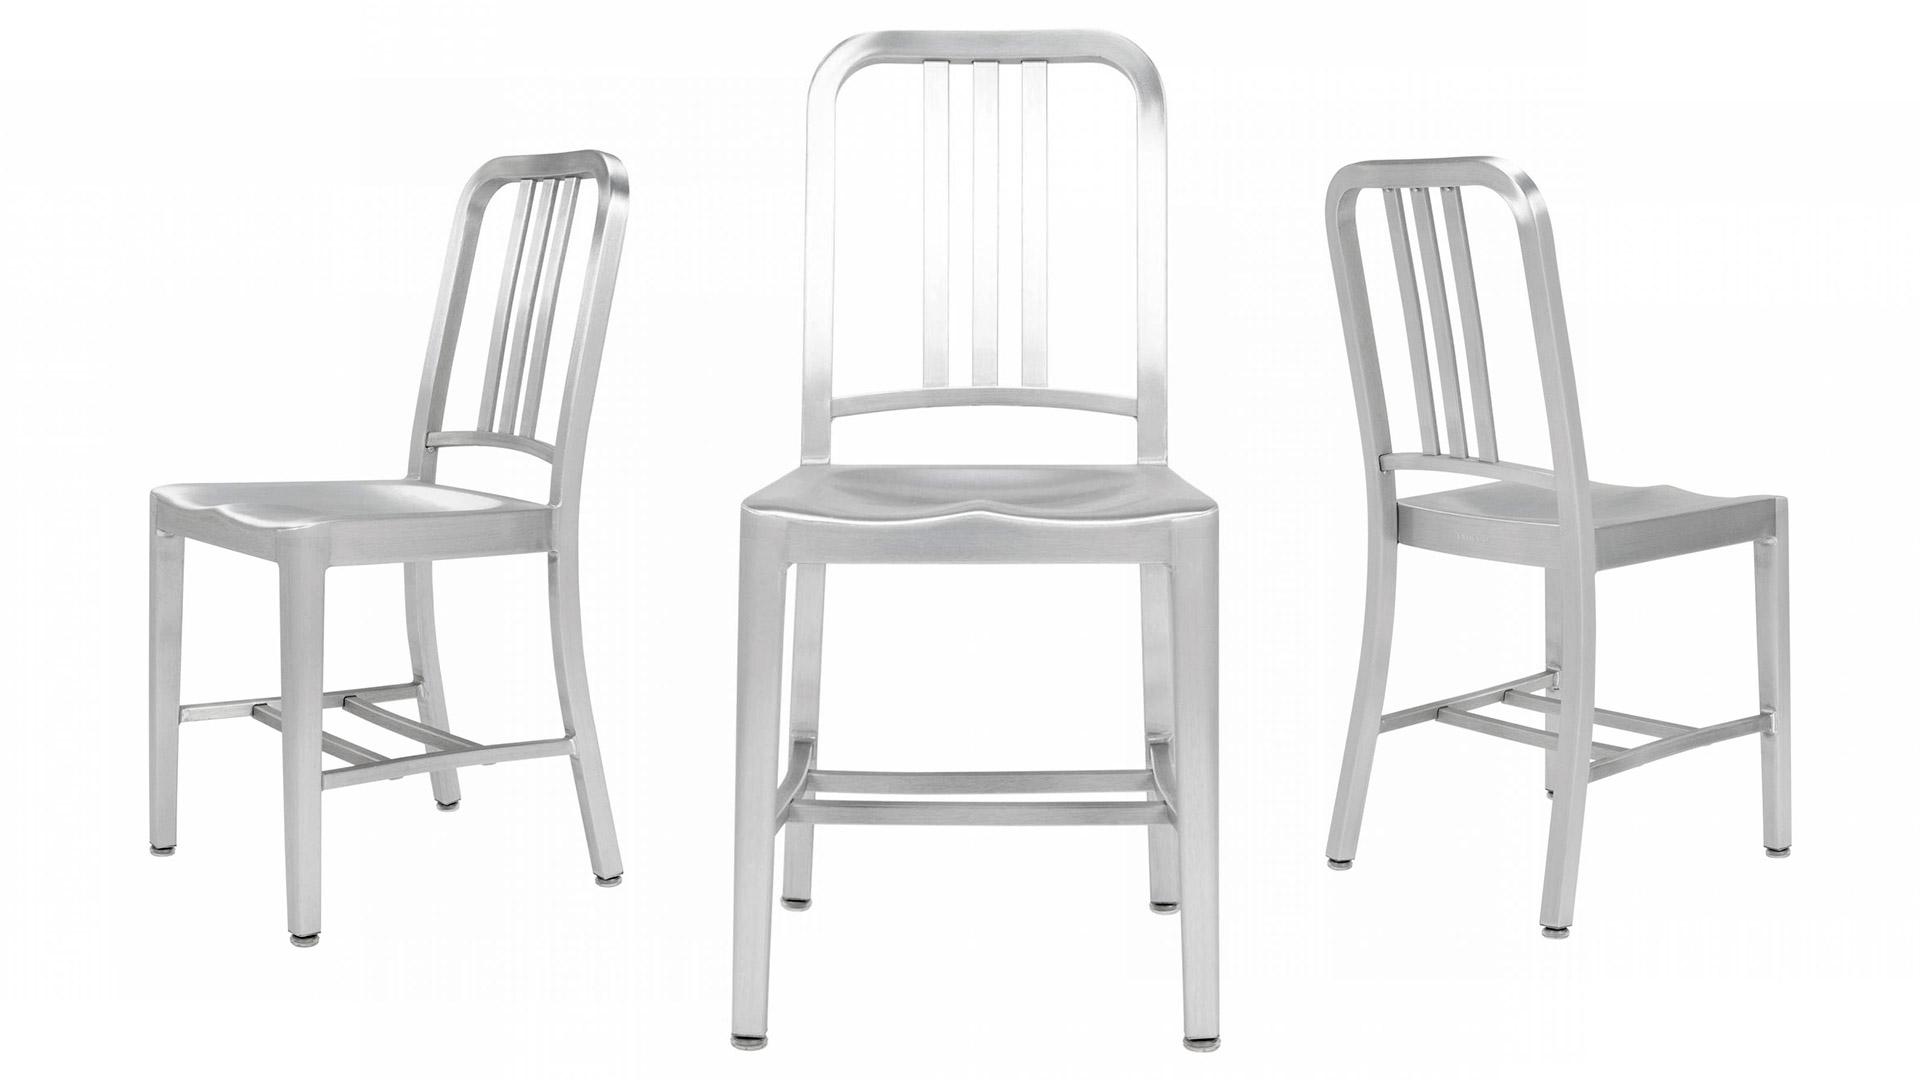 Židle 1006 Navy Chair. © Emeco